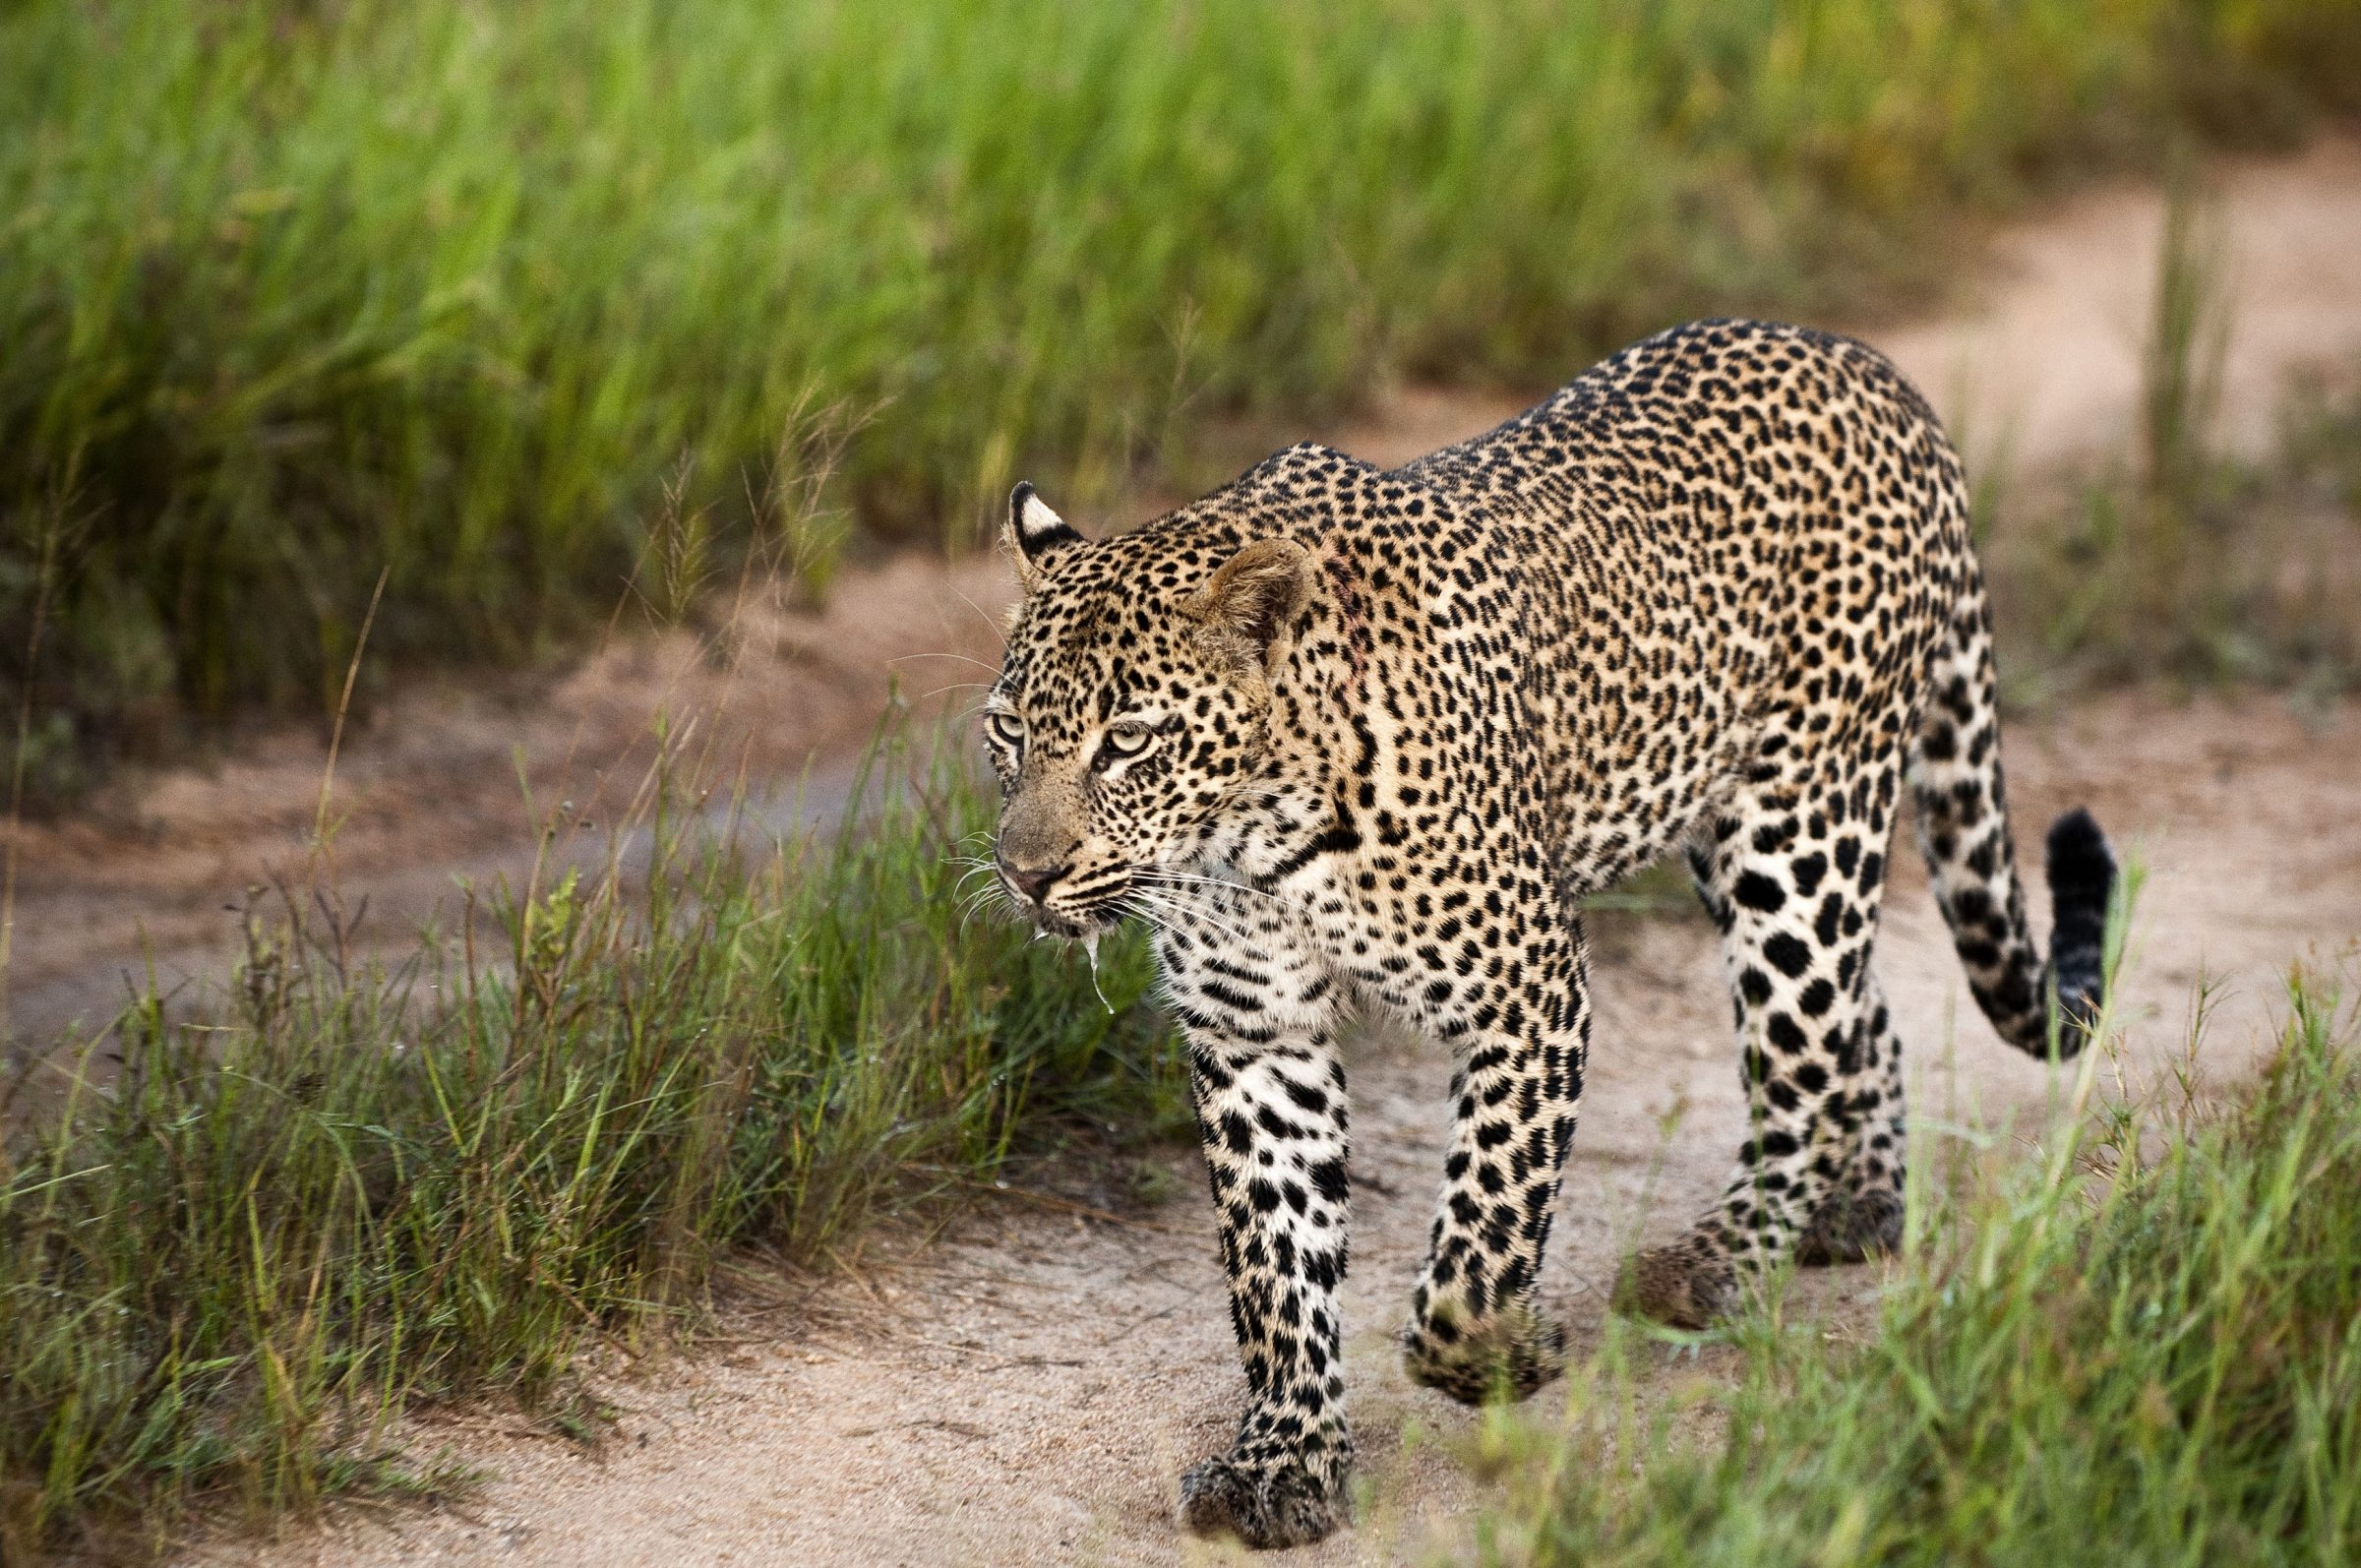 lion-sands-safari-humphrey-munson-blog-3